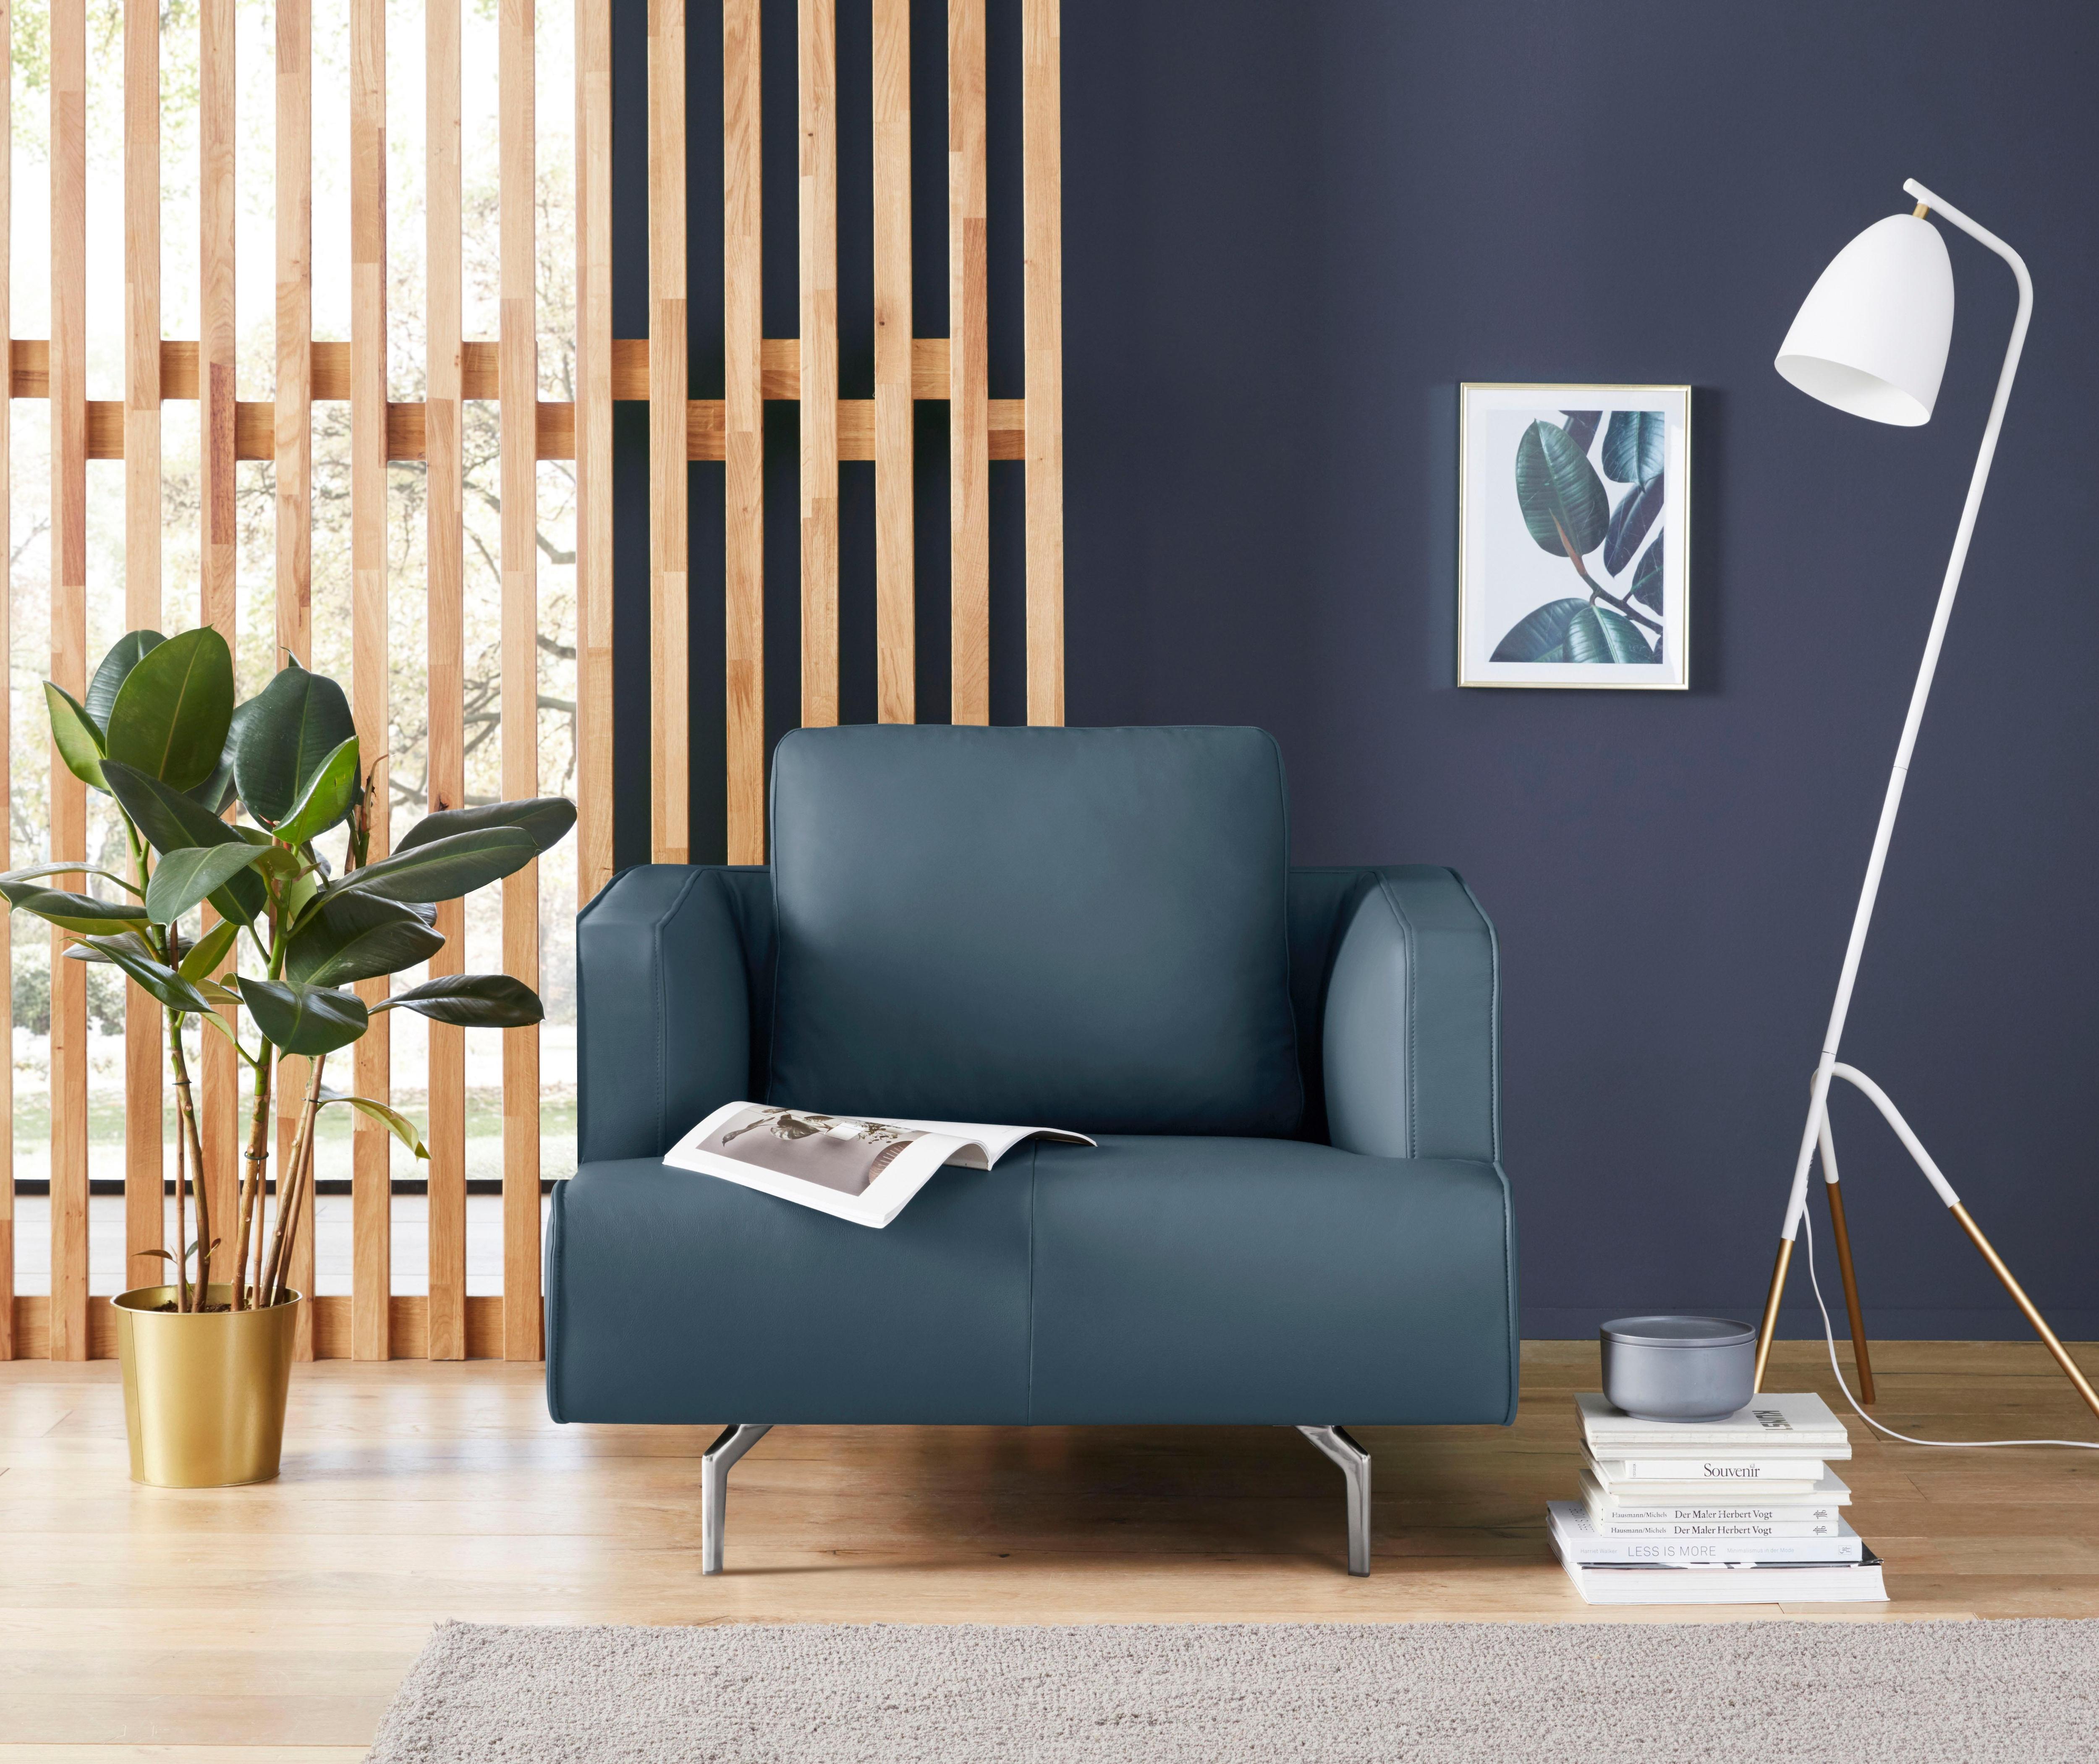 hülsta sofa Sessel »hs.440«, wahlweise in Stoff oder Leder, Gussfüße polier günstig online kaufen